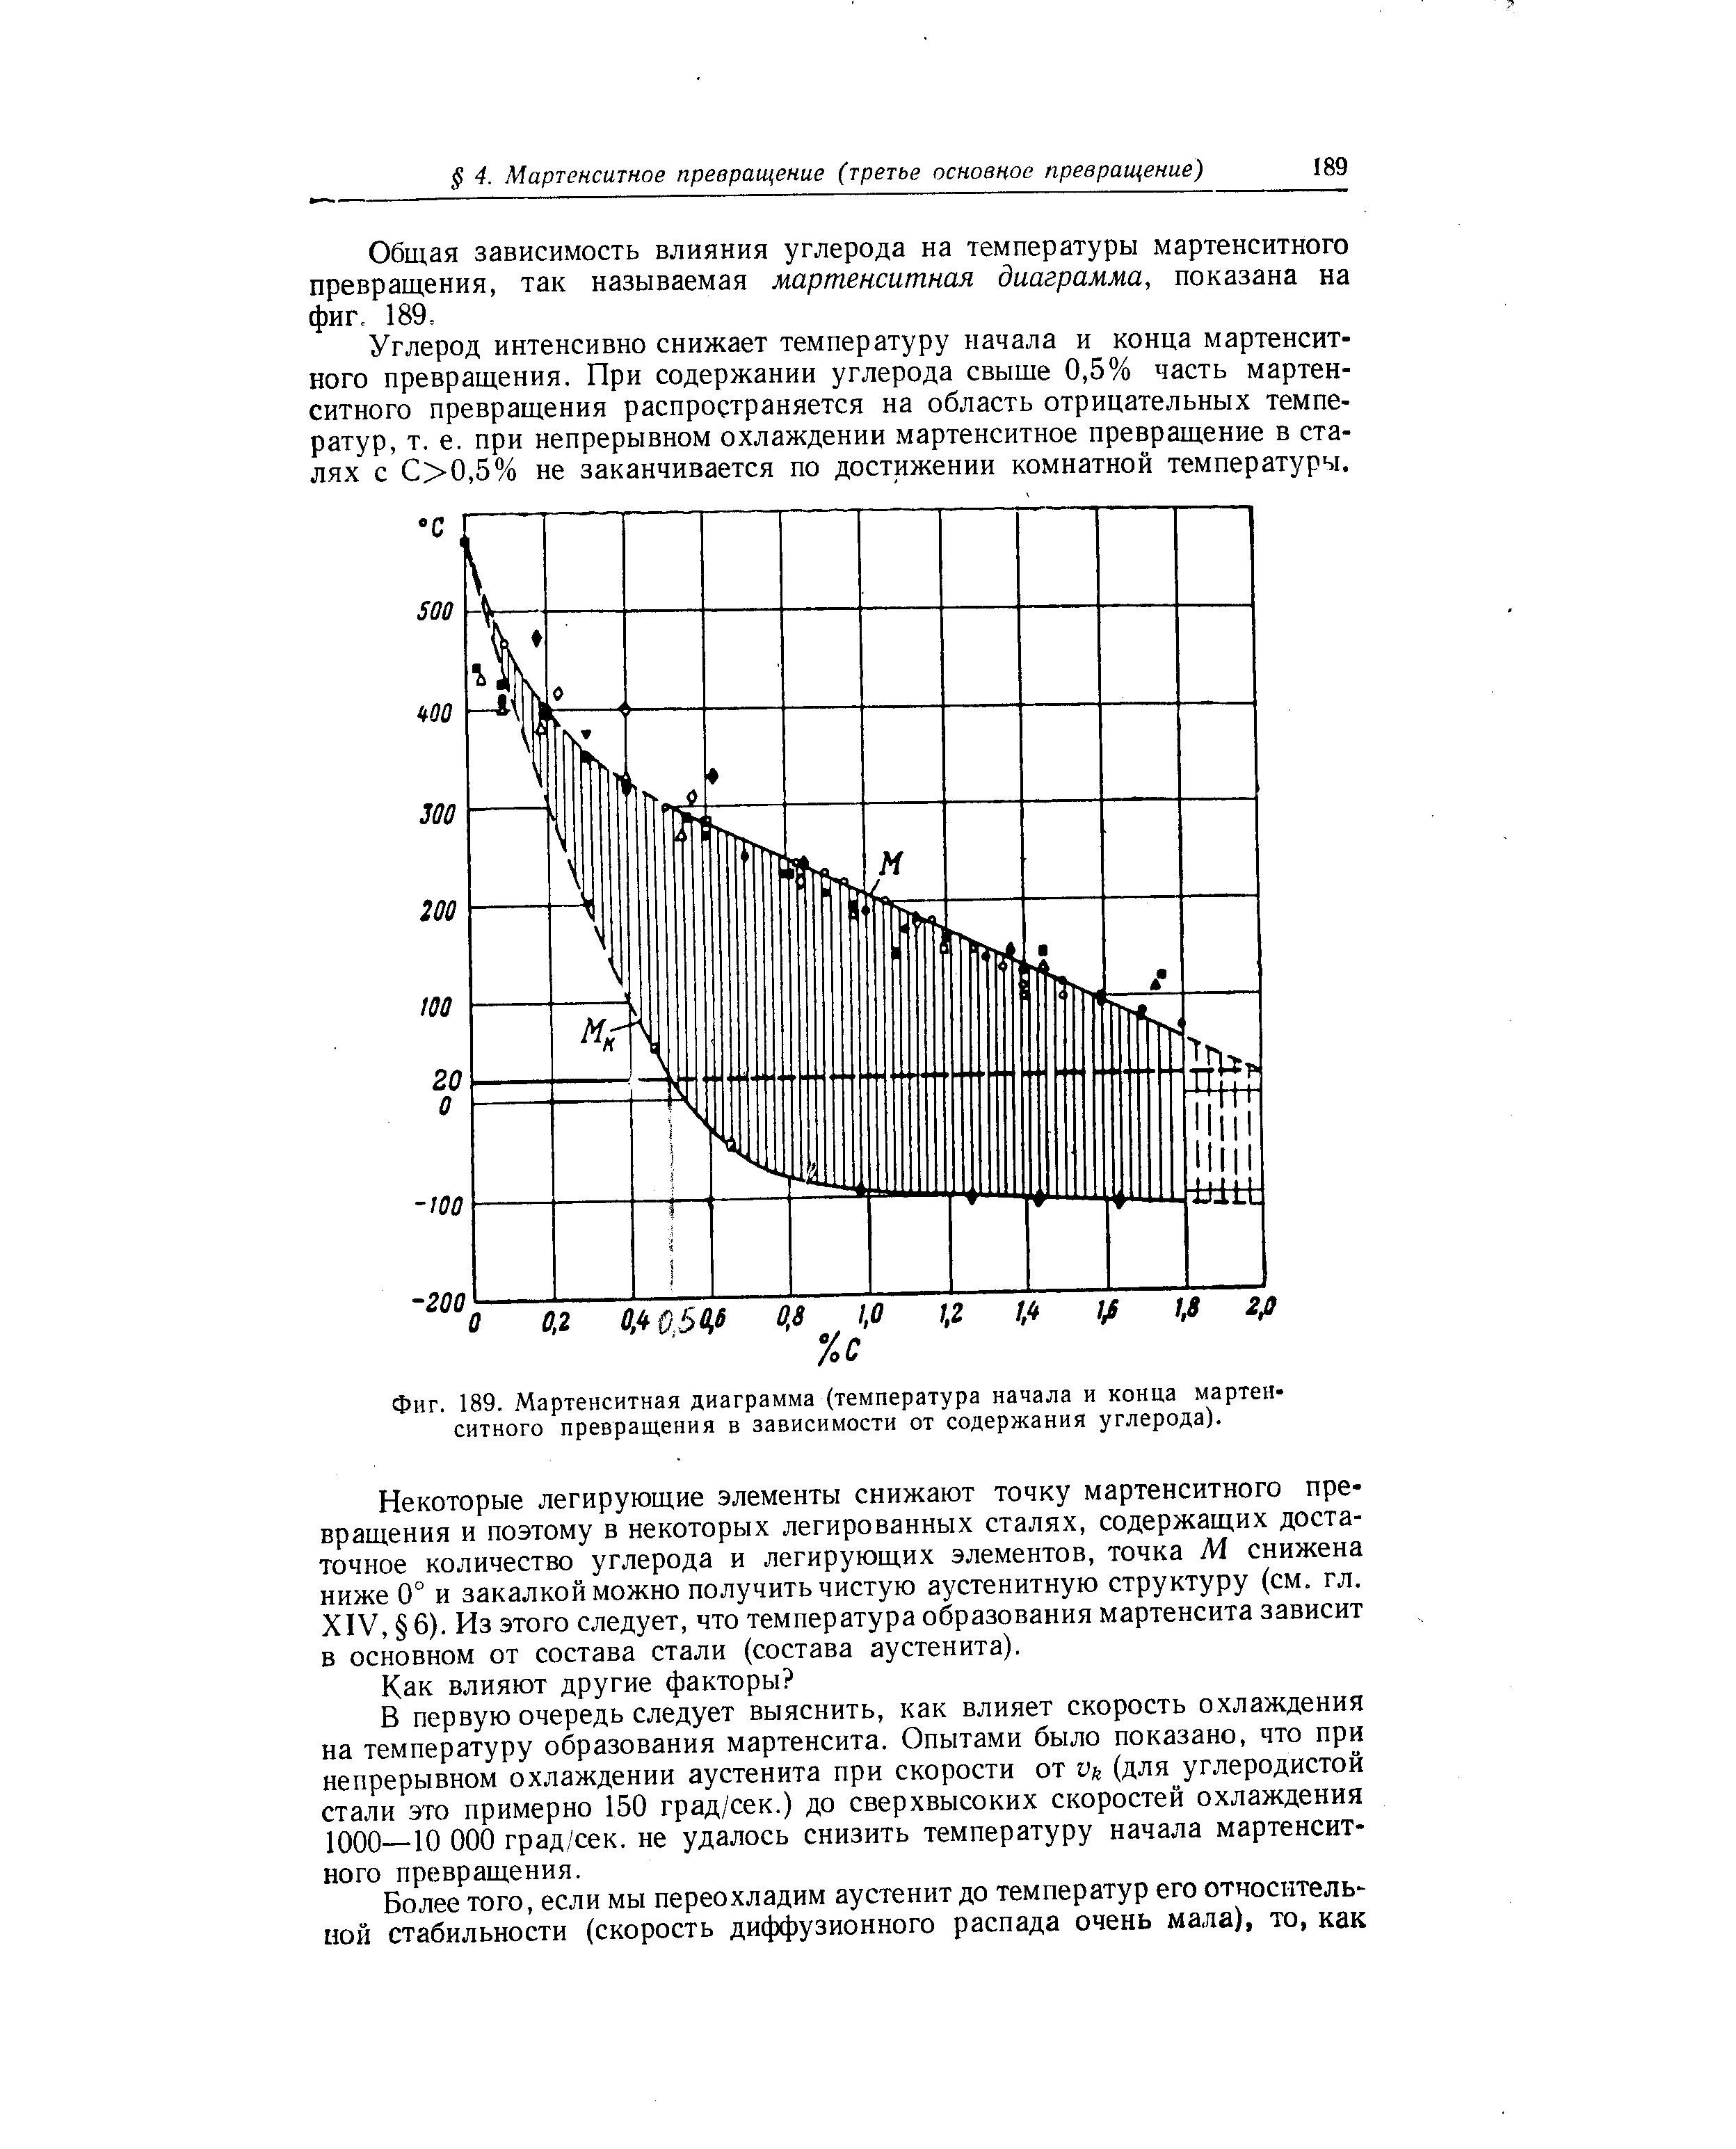 Мартенситное превращение в стали